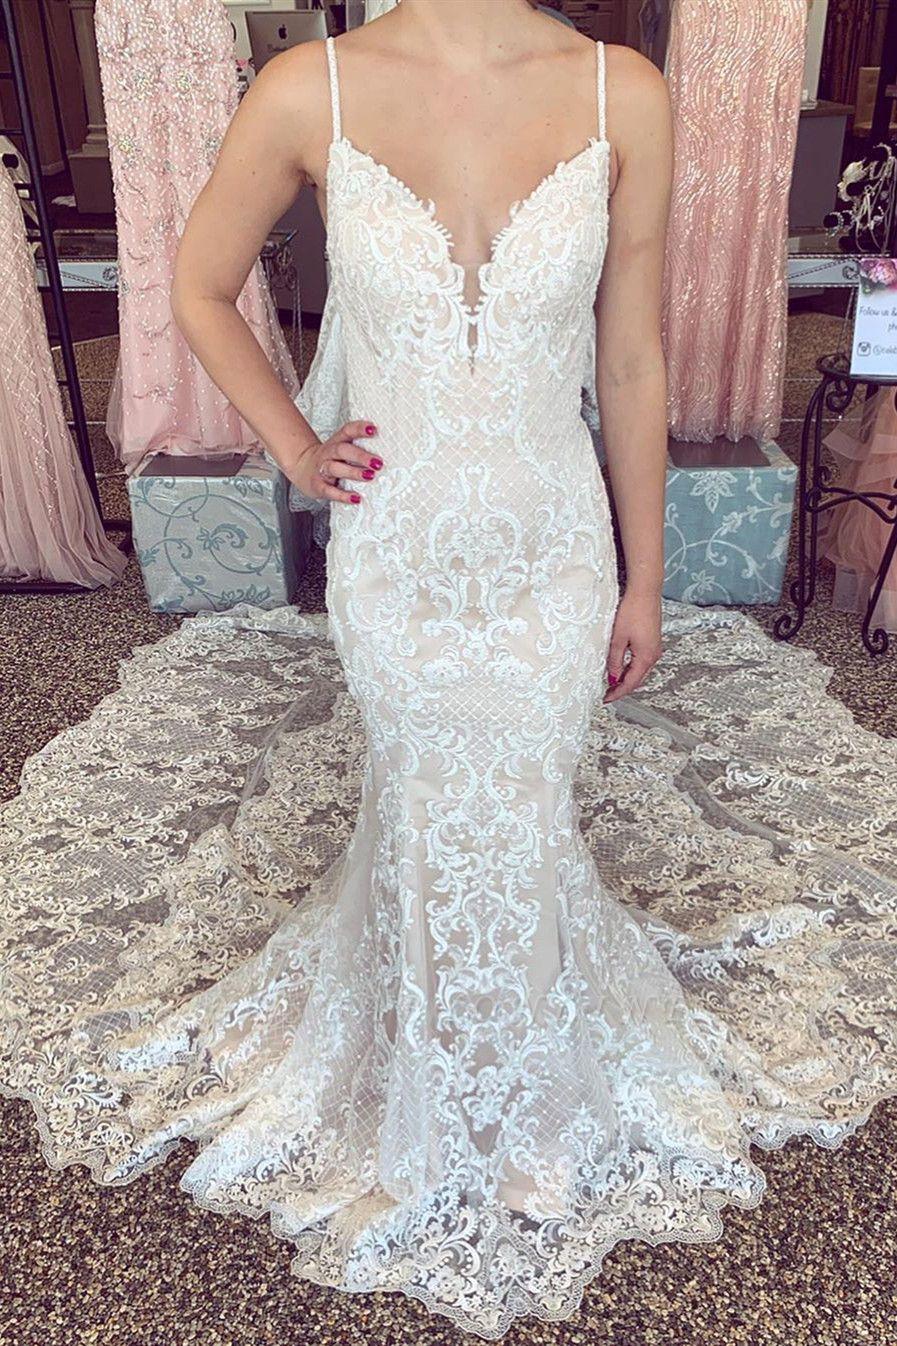 Sexy Lace Mermaid Wedding Dresses | Spaghetti Straps V-neck Lace Bridal Dresses